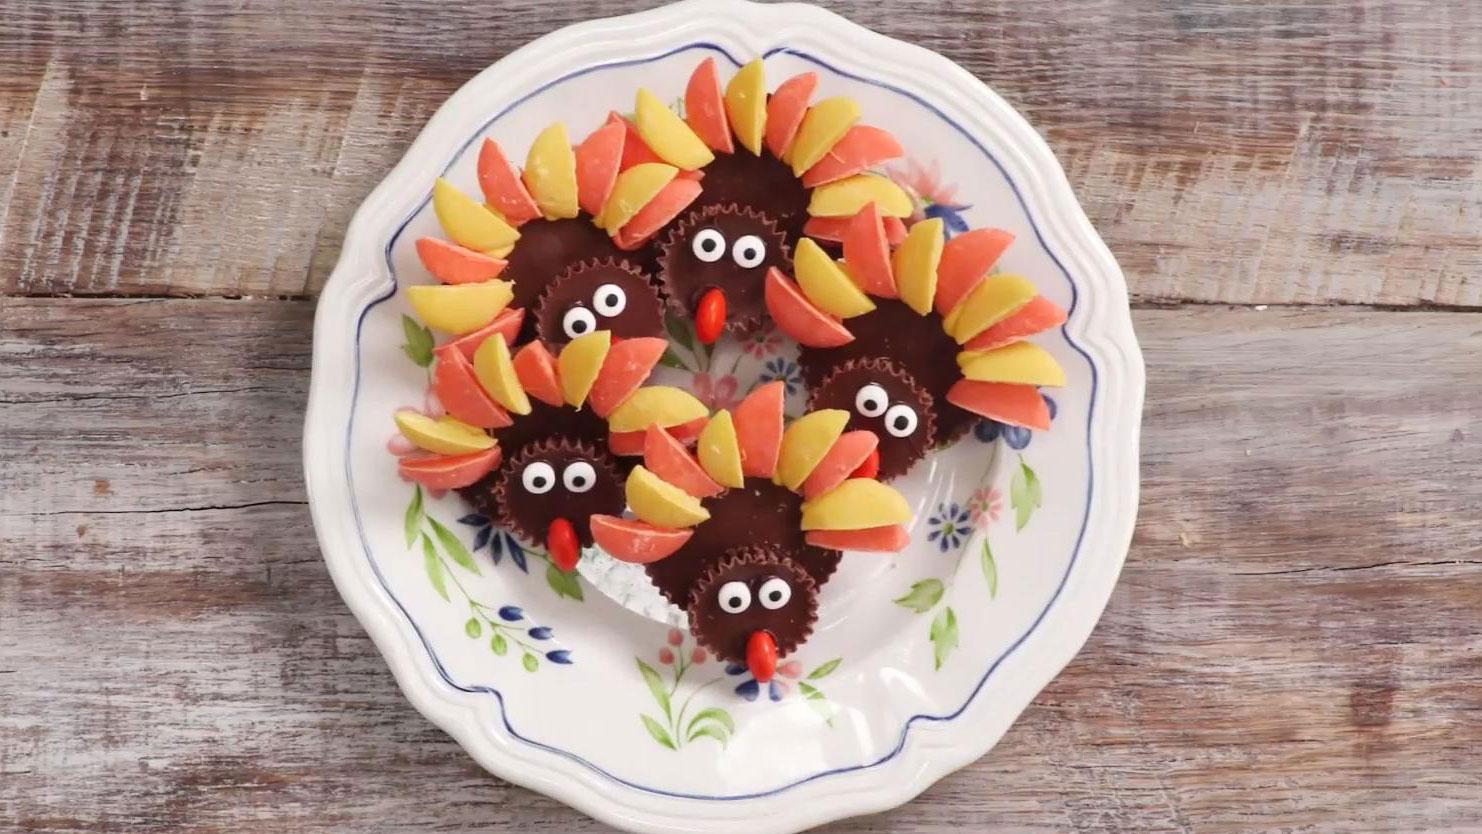 Chocolate-Peanut Butter Turkeys